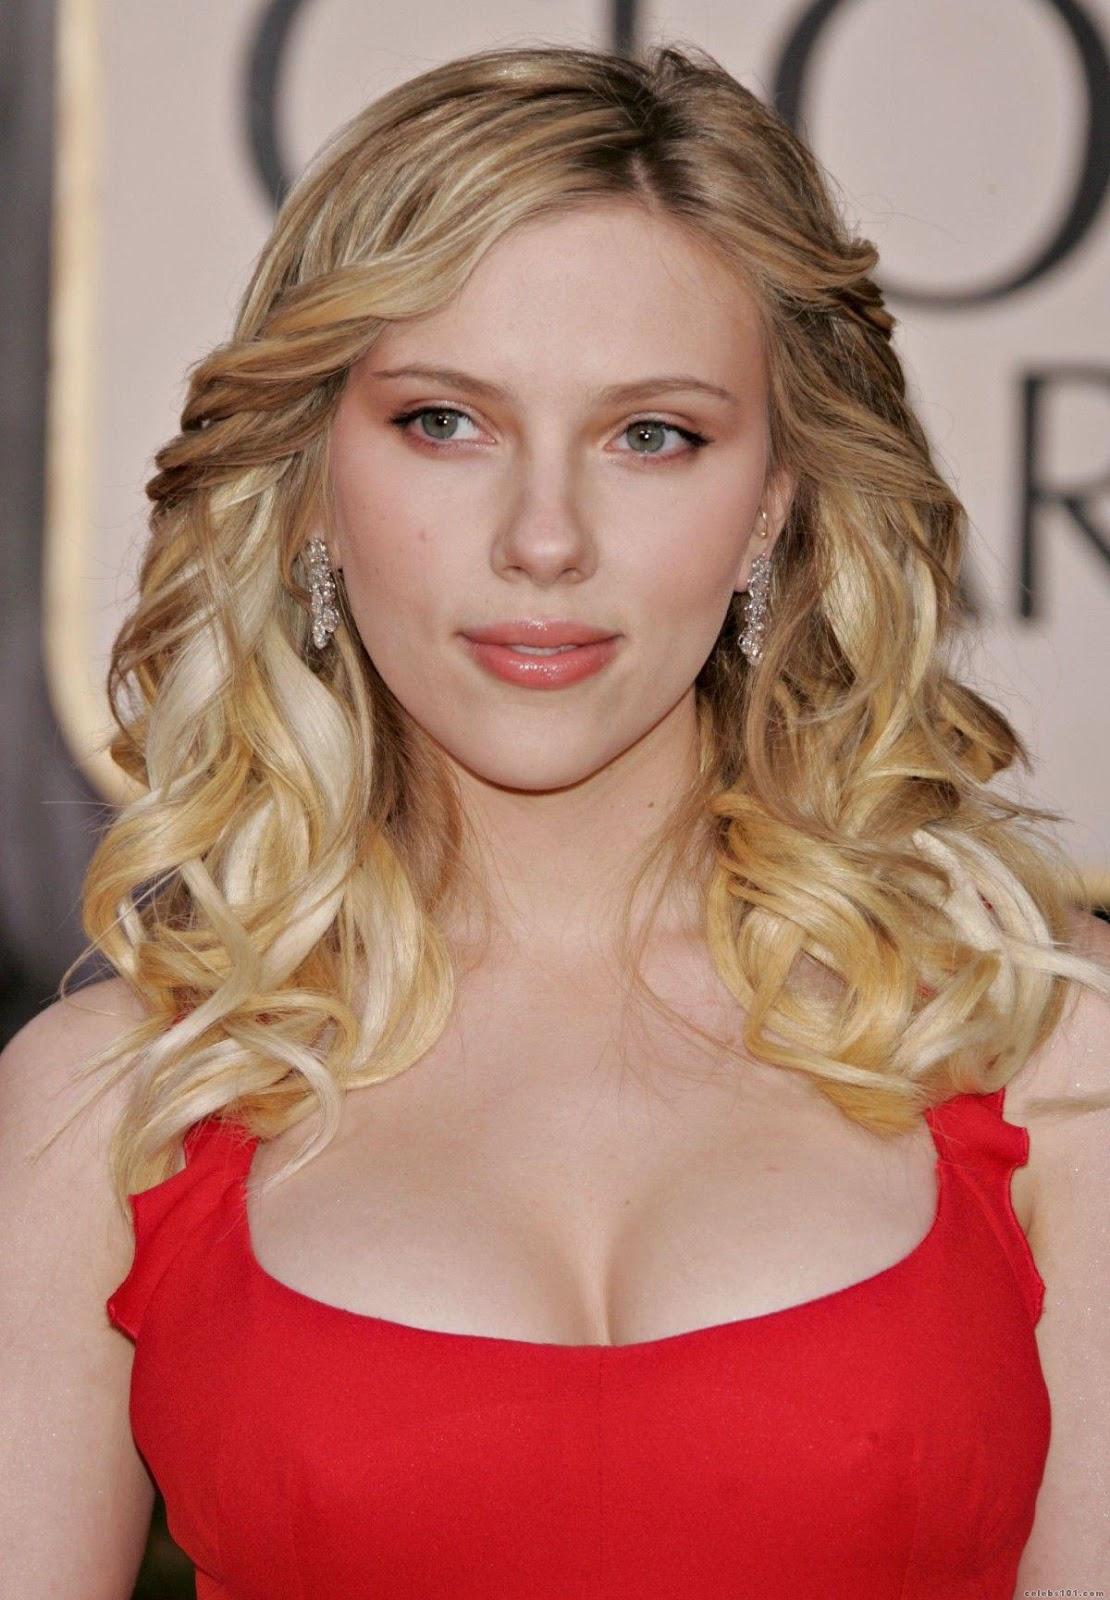 http://2.bp.blogspot.com/-C6ZVGGc_OPc/UIVhf1xkN0I/AAAAAAAAAI8/209fEotOous/s1600/Scarlett+Johansson+portrait.jpg